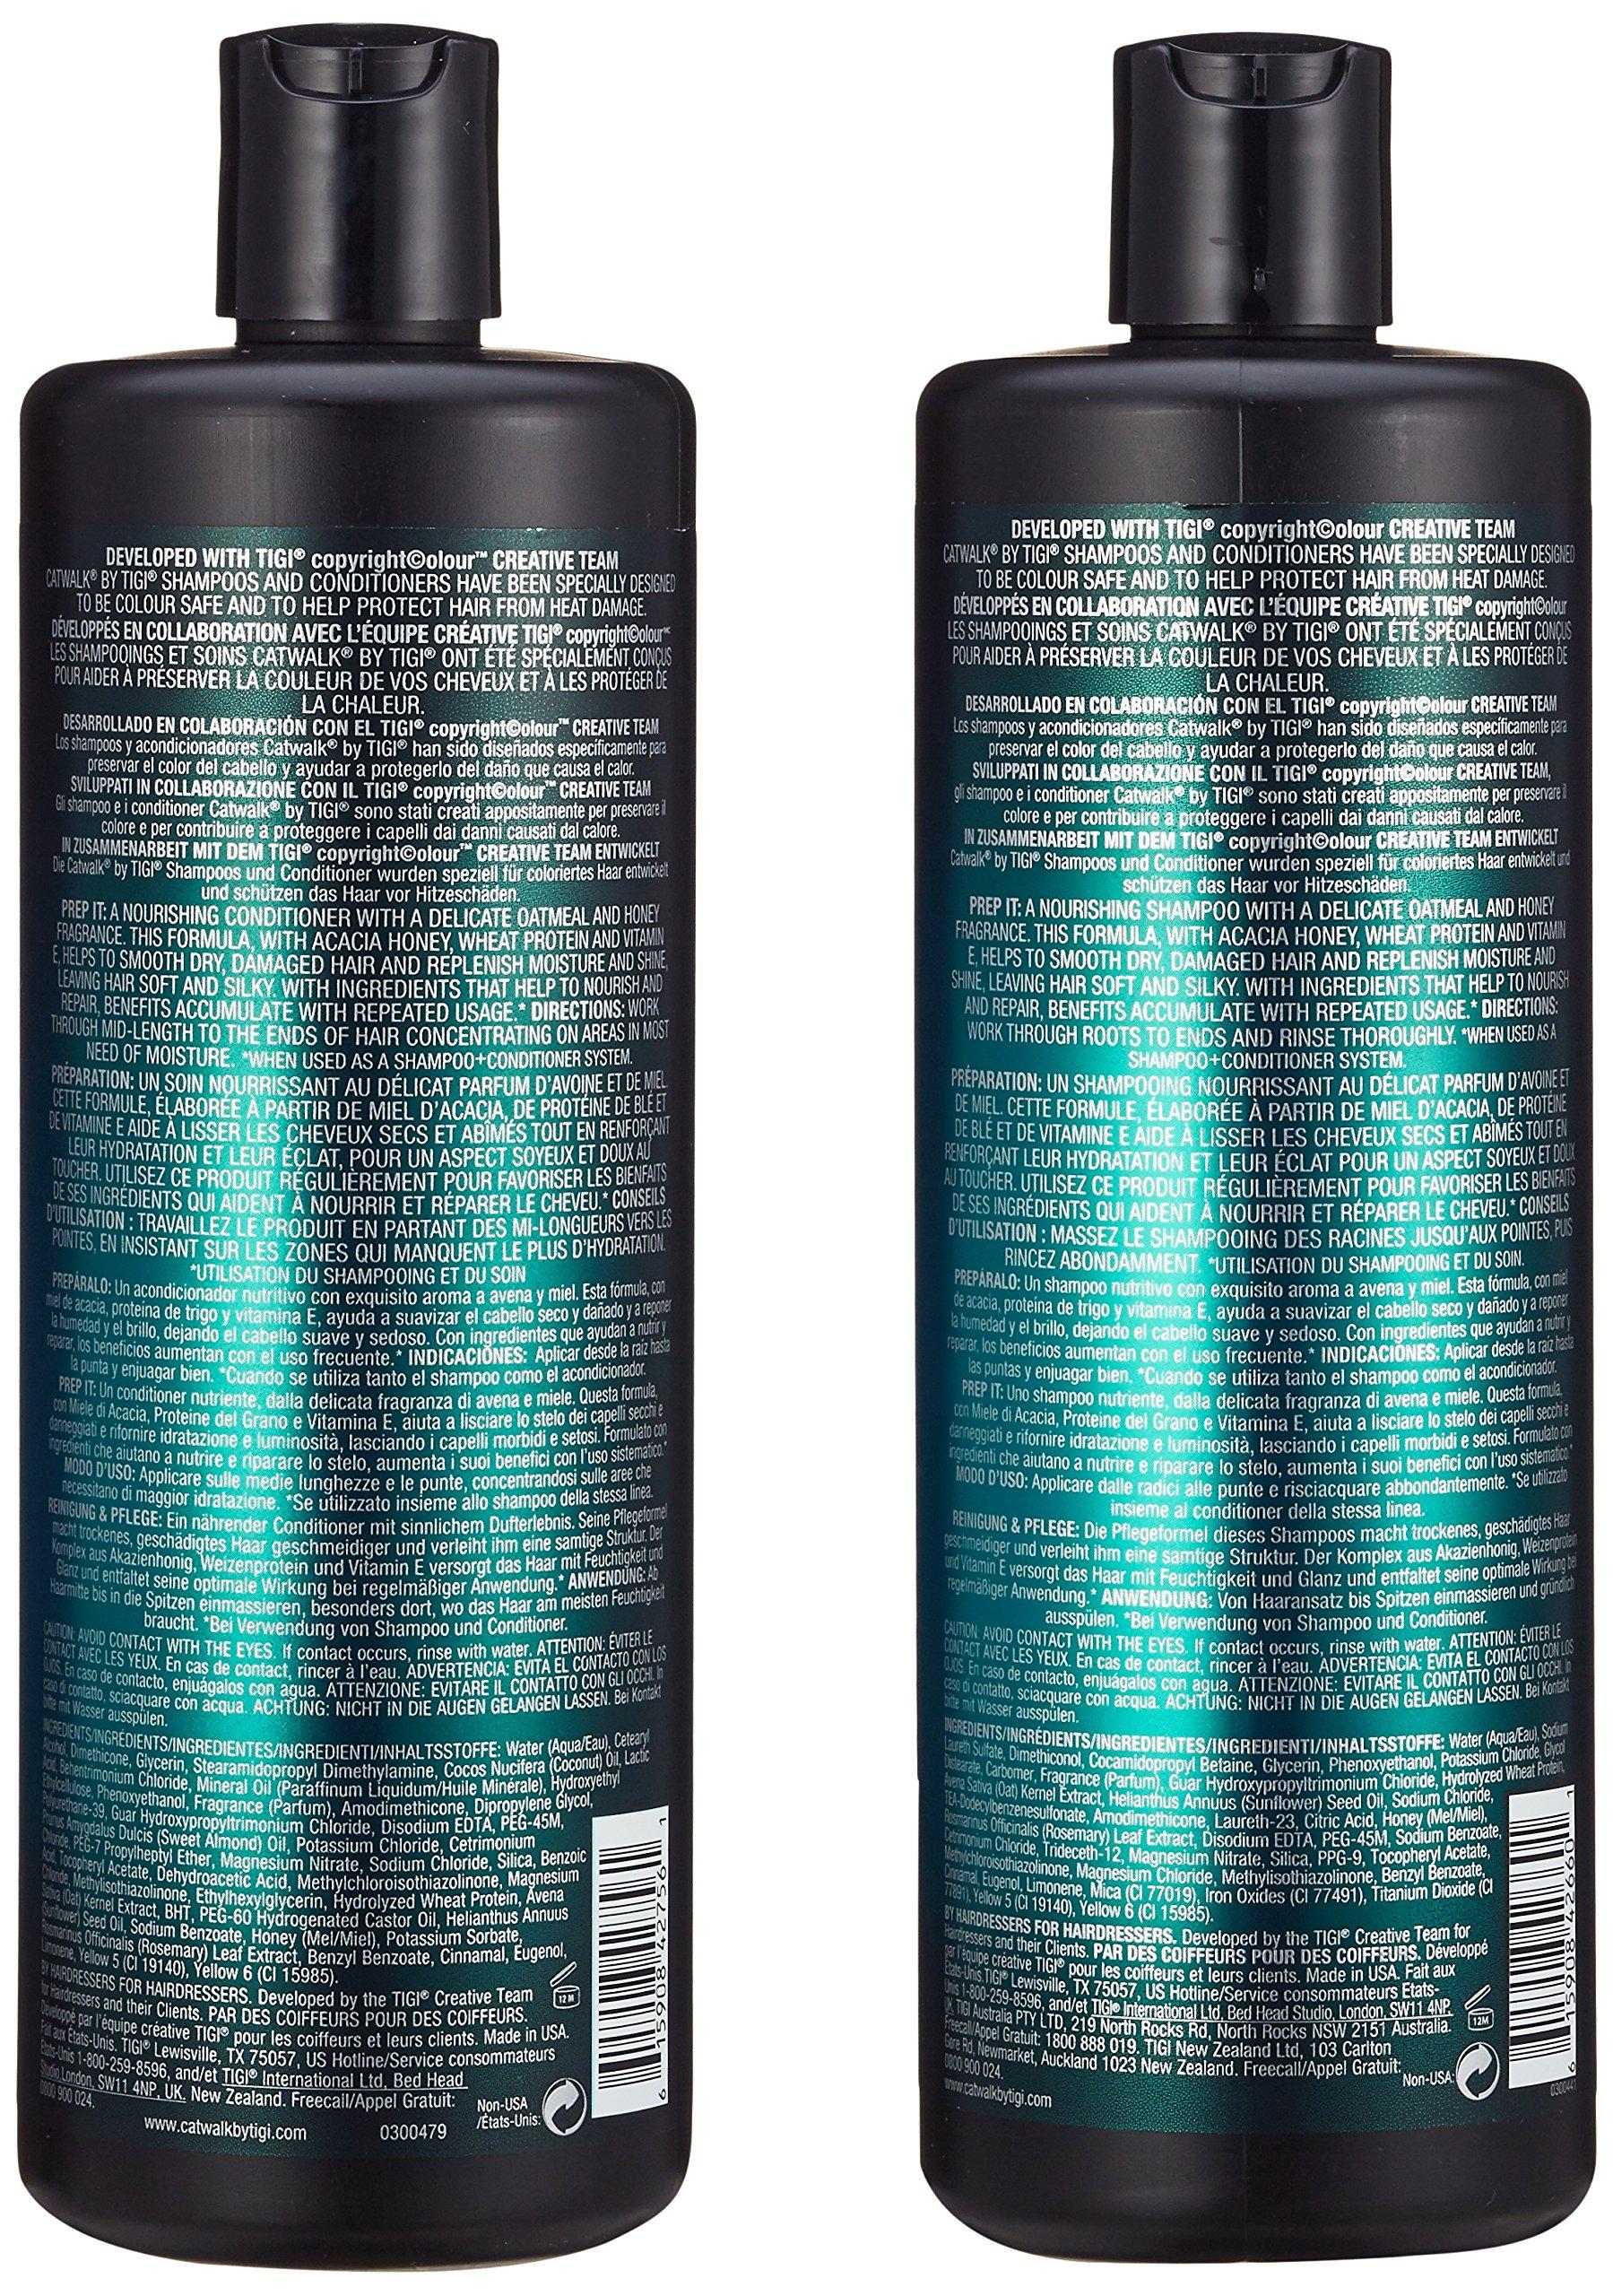 TIGI Catwalk Oatmeal & Honey Shampoo and Conditioner Tween Duo 2 x 750ml by TIGI